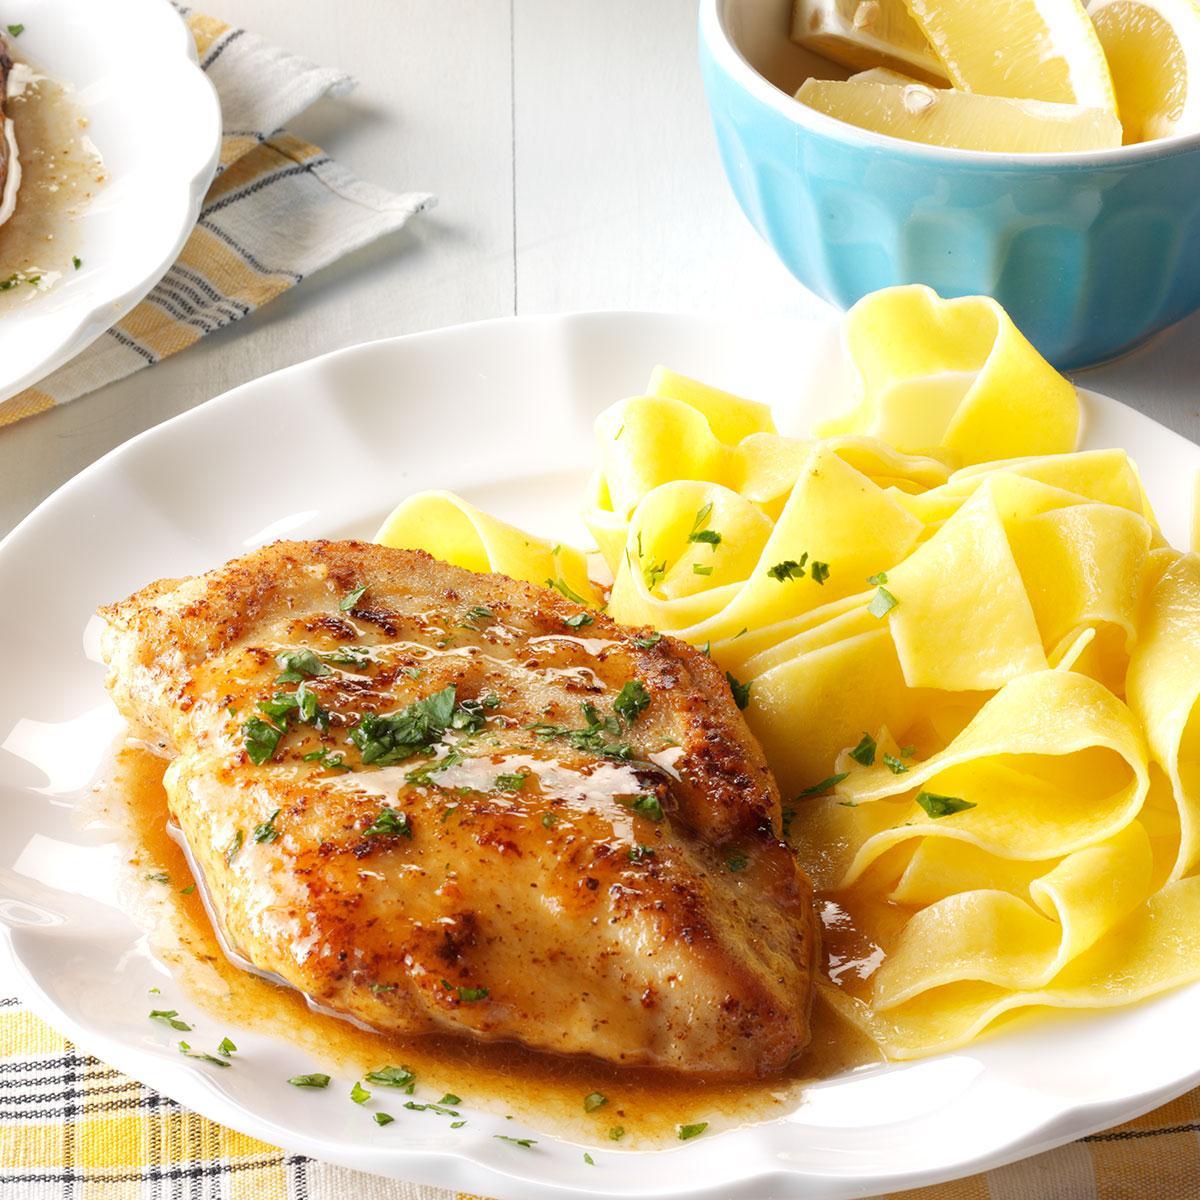 10 Stylish Dinner Ideas With Boneless Chicken Breast quick chicken piccata recipe taste of home 2020